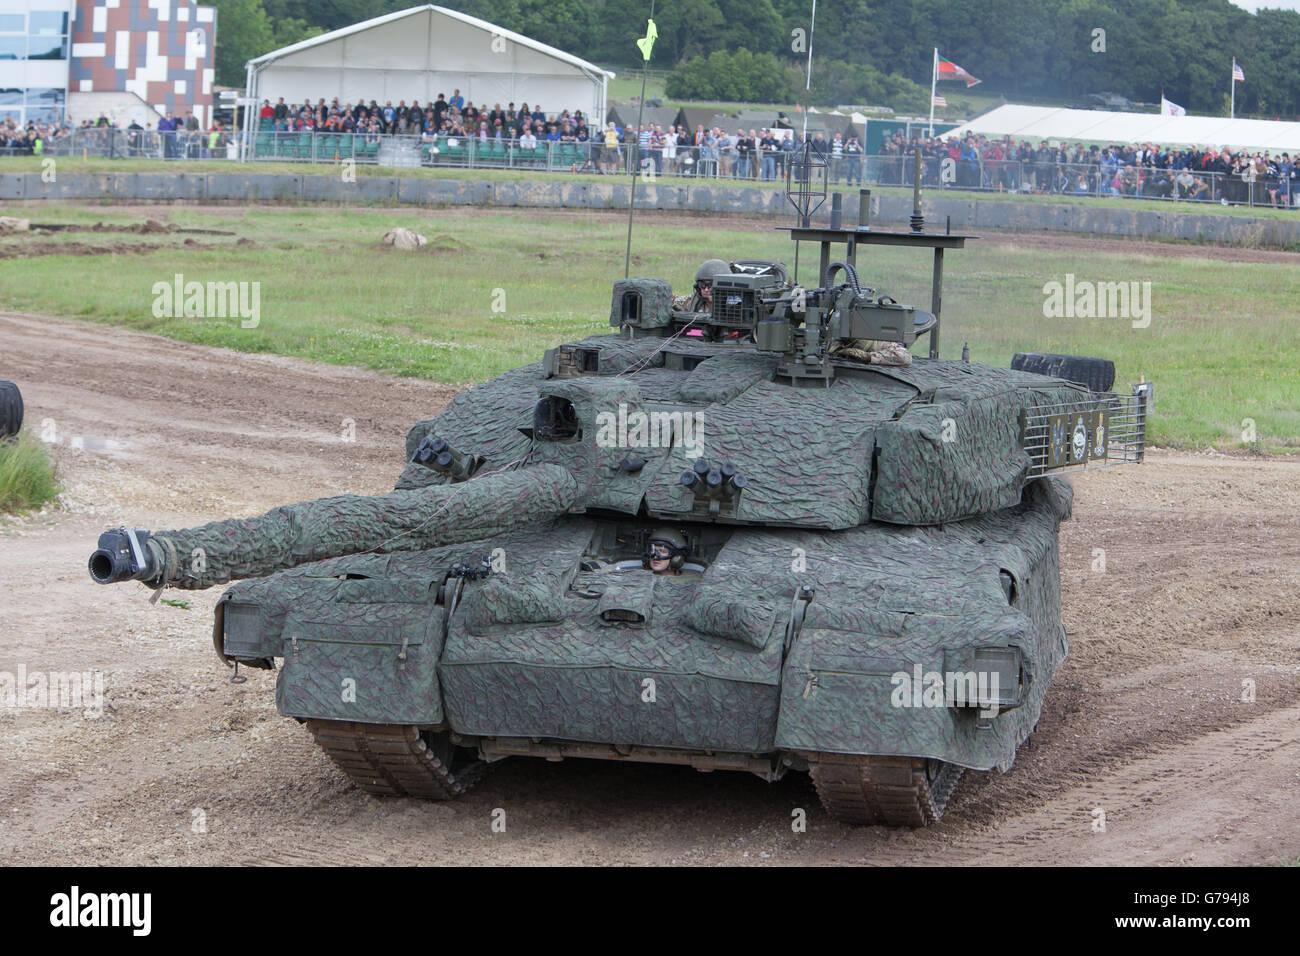 0e2eede33c97 British Army Challenger 2 Main Battle Tank Stock Photos   British ...